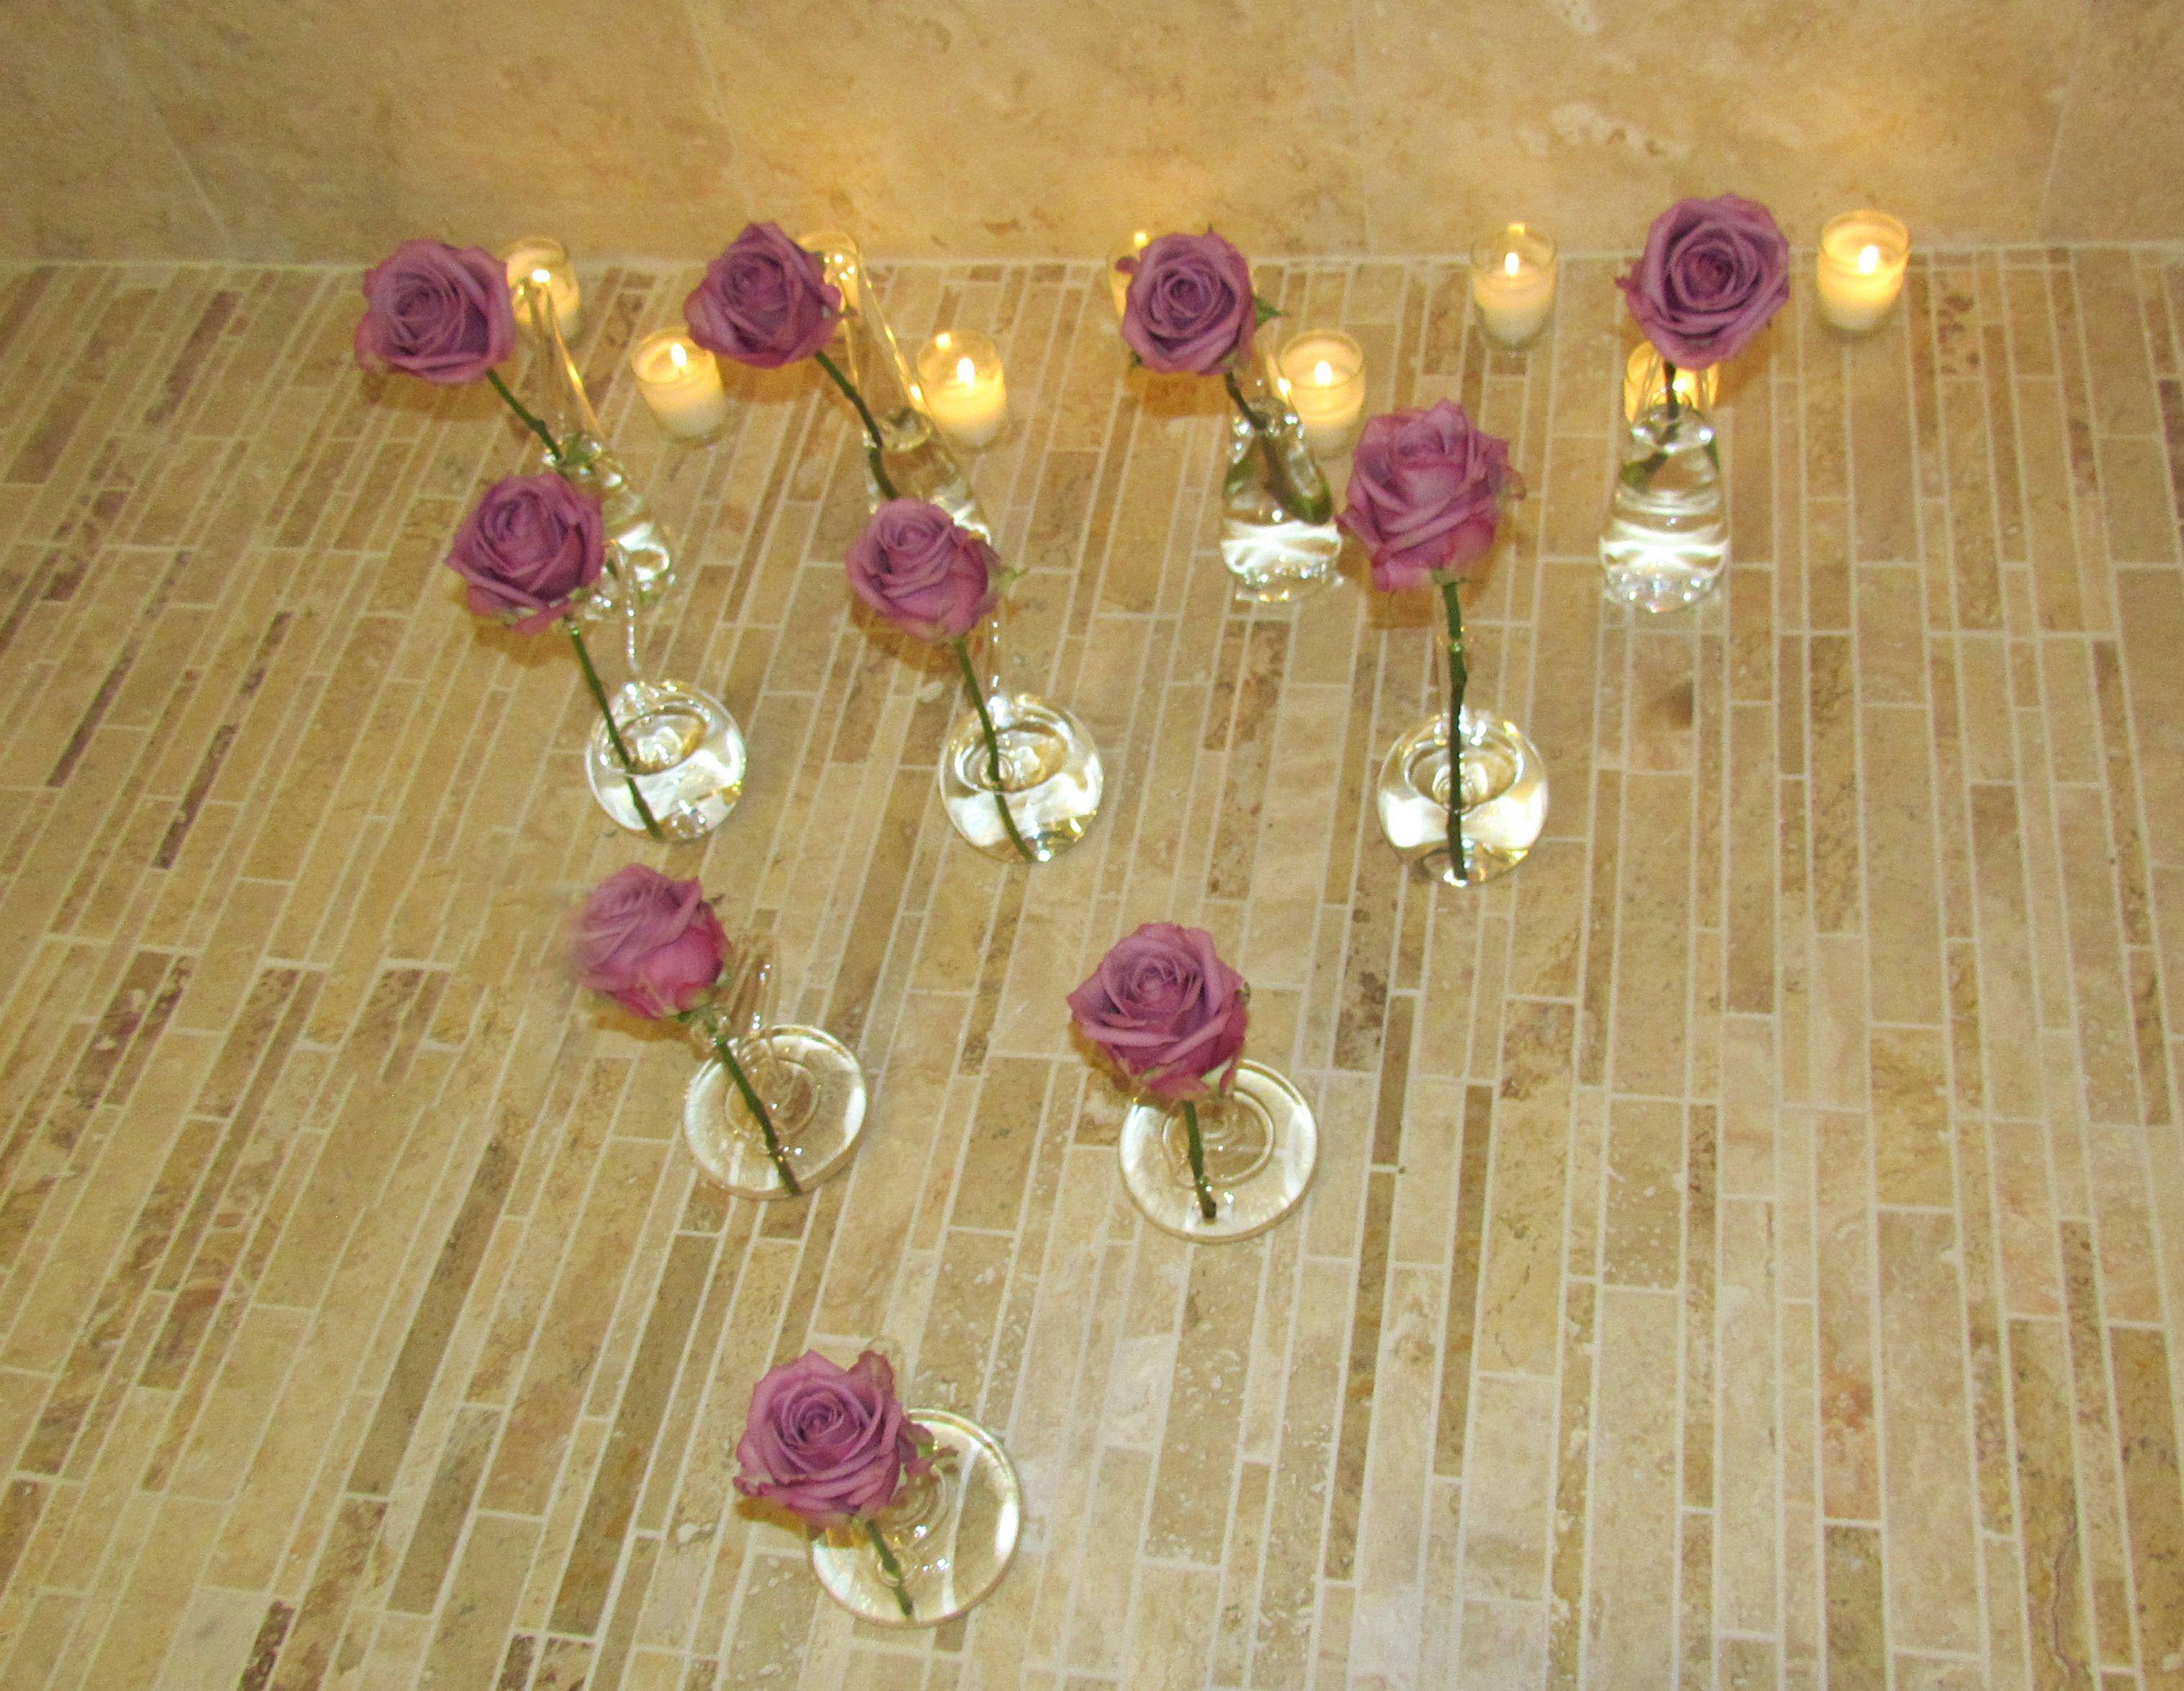 Single Stem Glass Flower Vases #roses #flowers #floraldesign #interiordesign #accessories #homedecor